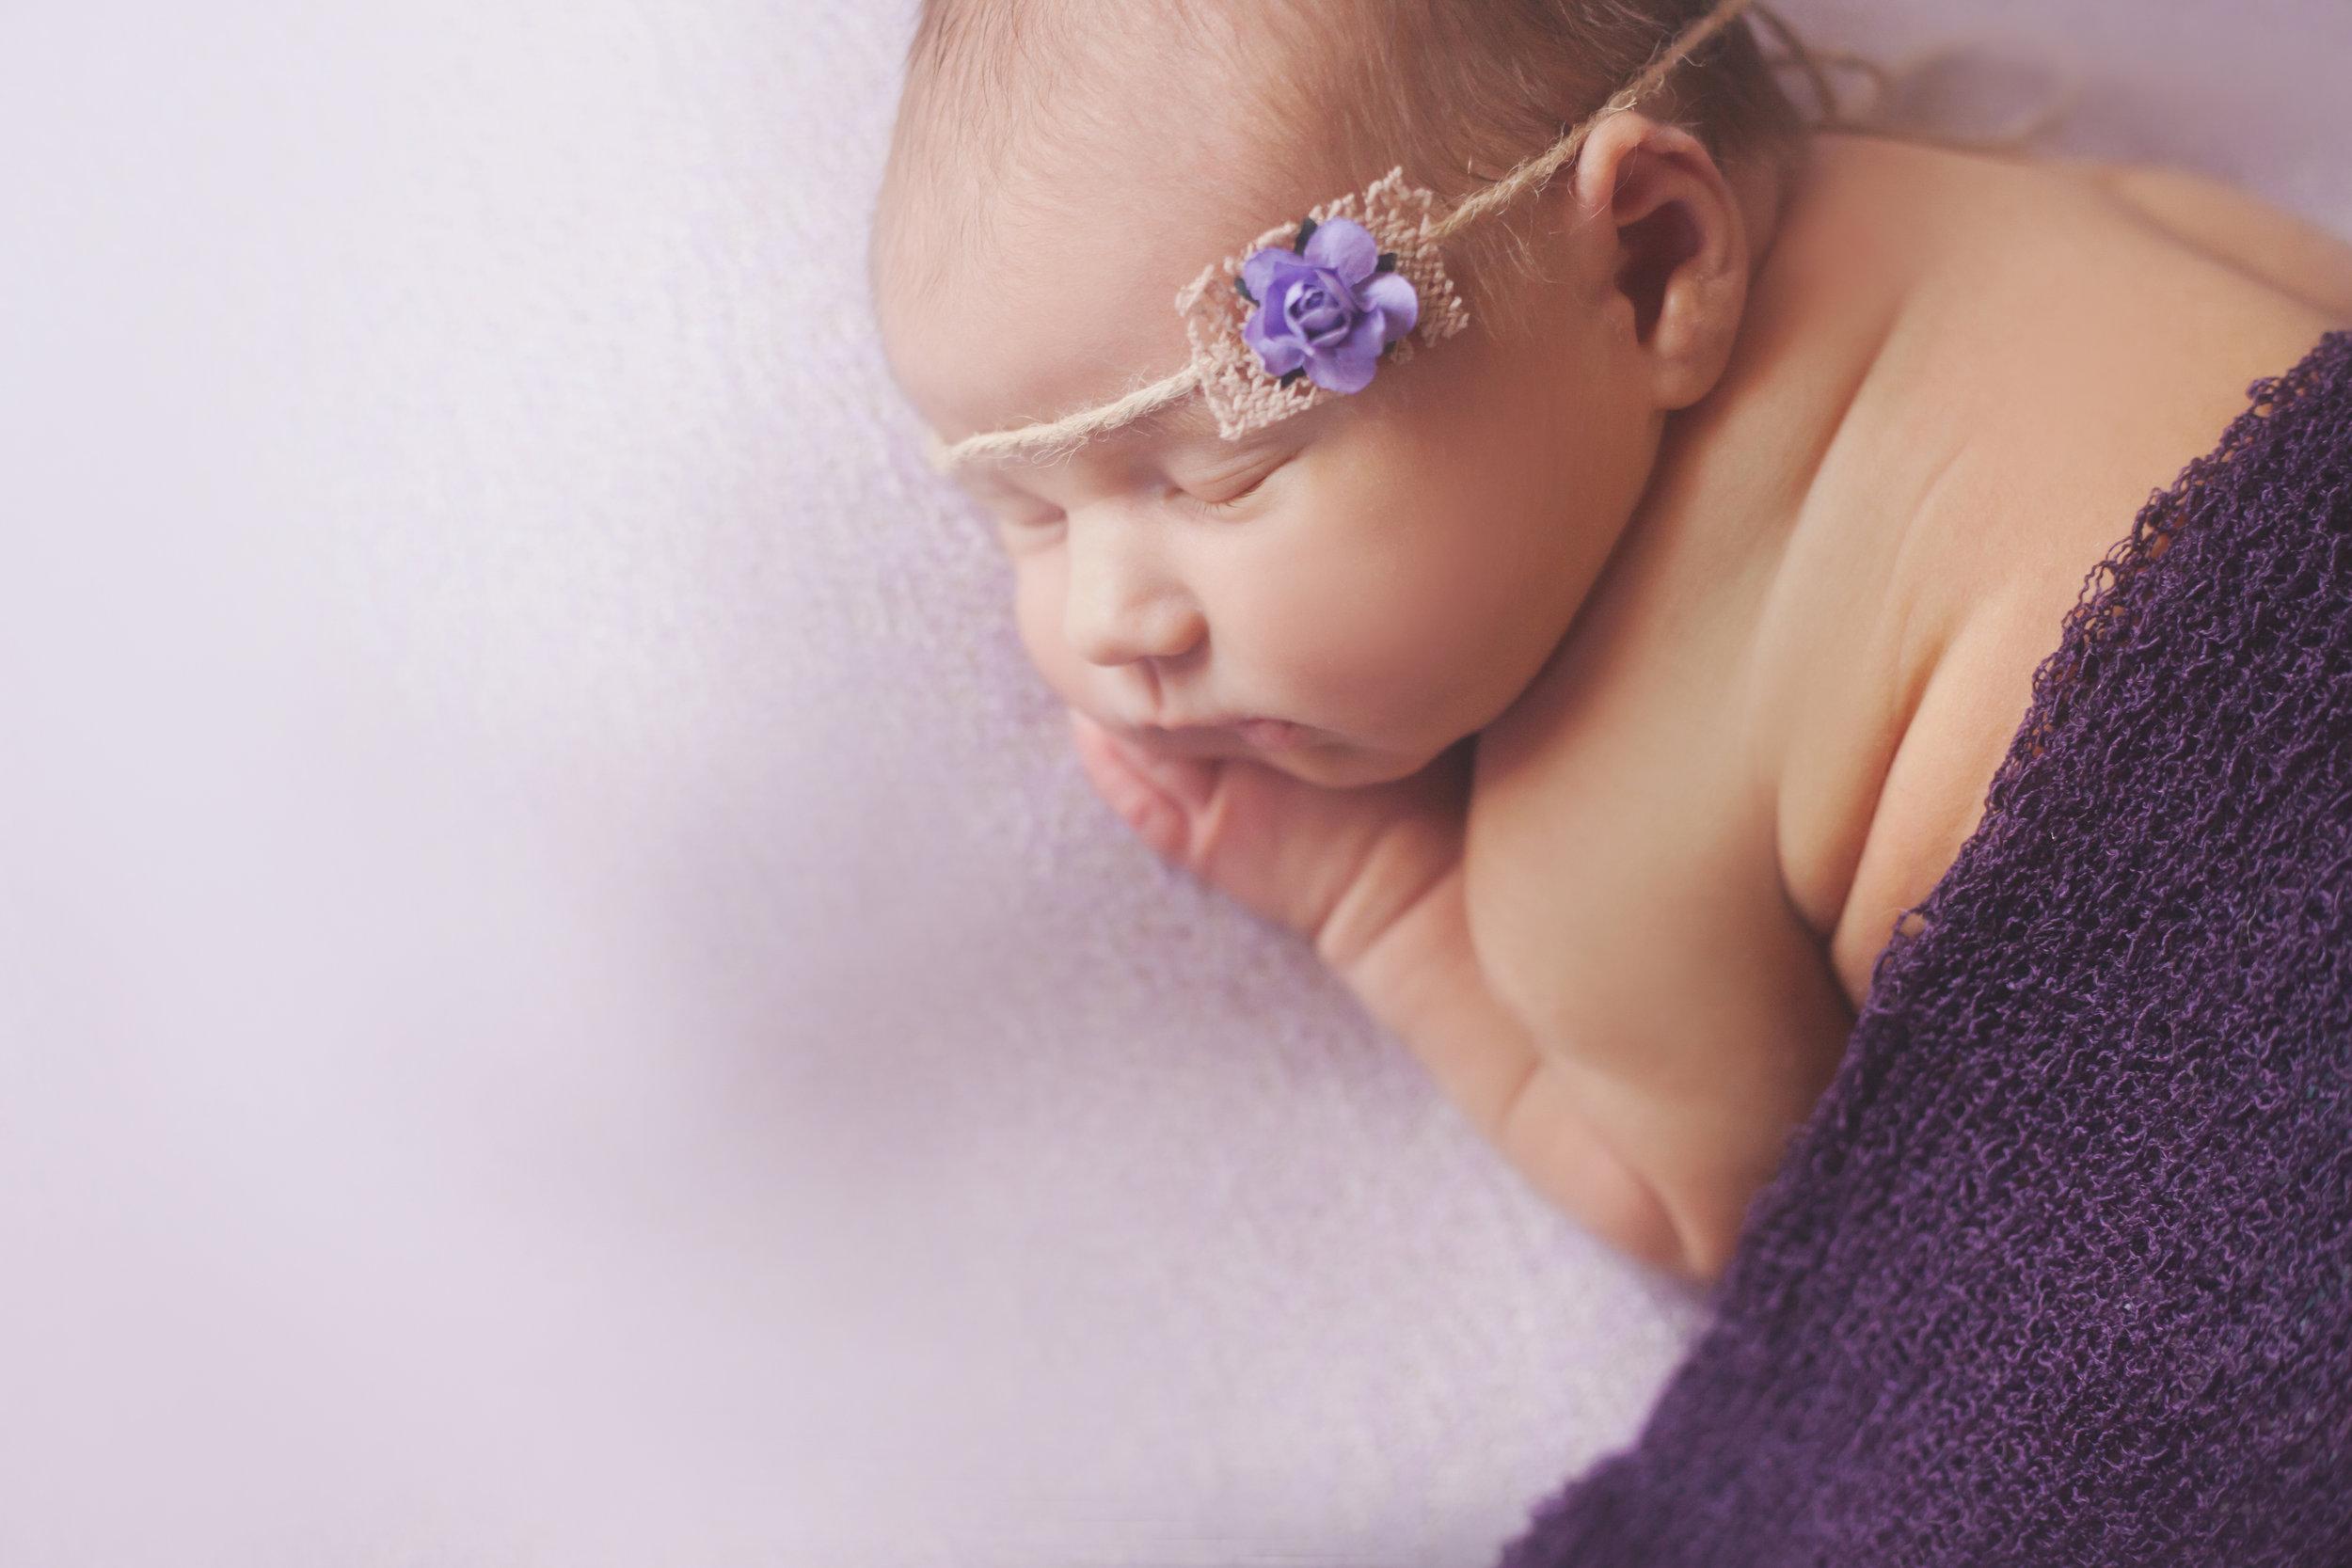 Blush-Little-Baby-Plano-Newborn-Photography-Maisey-2.jpg